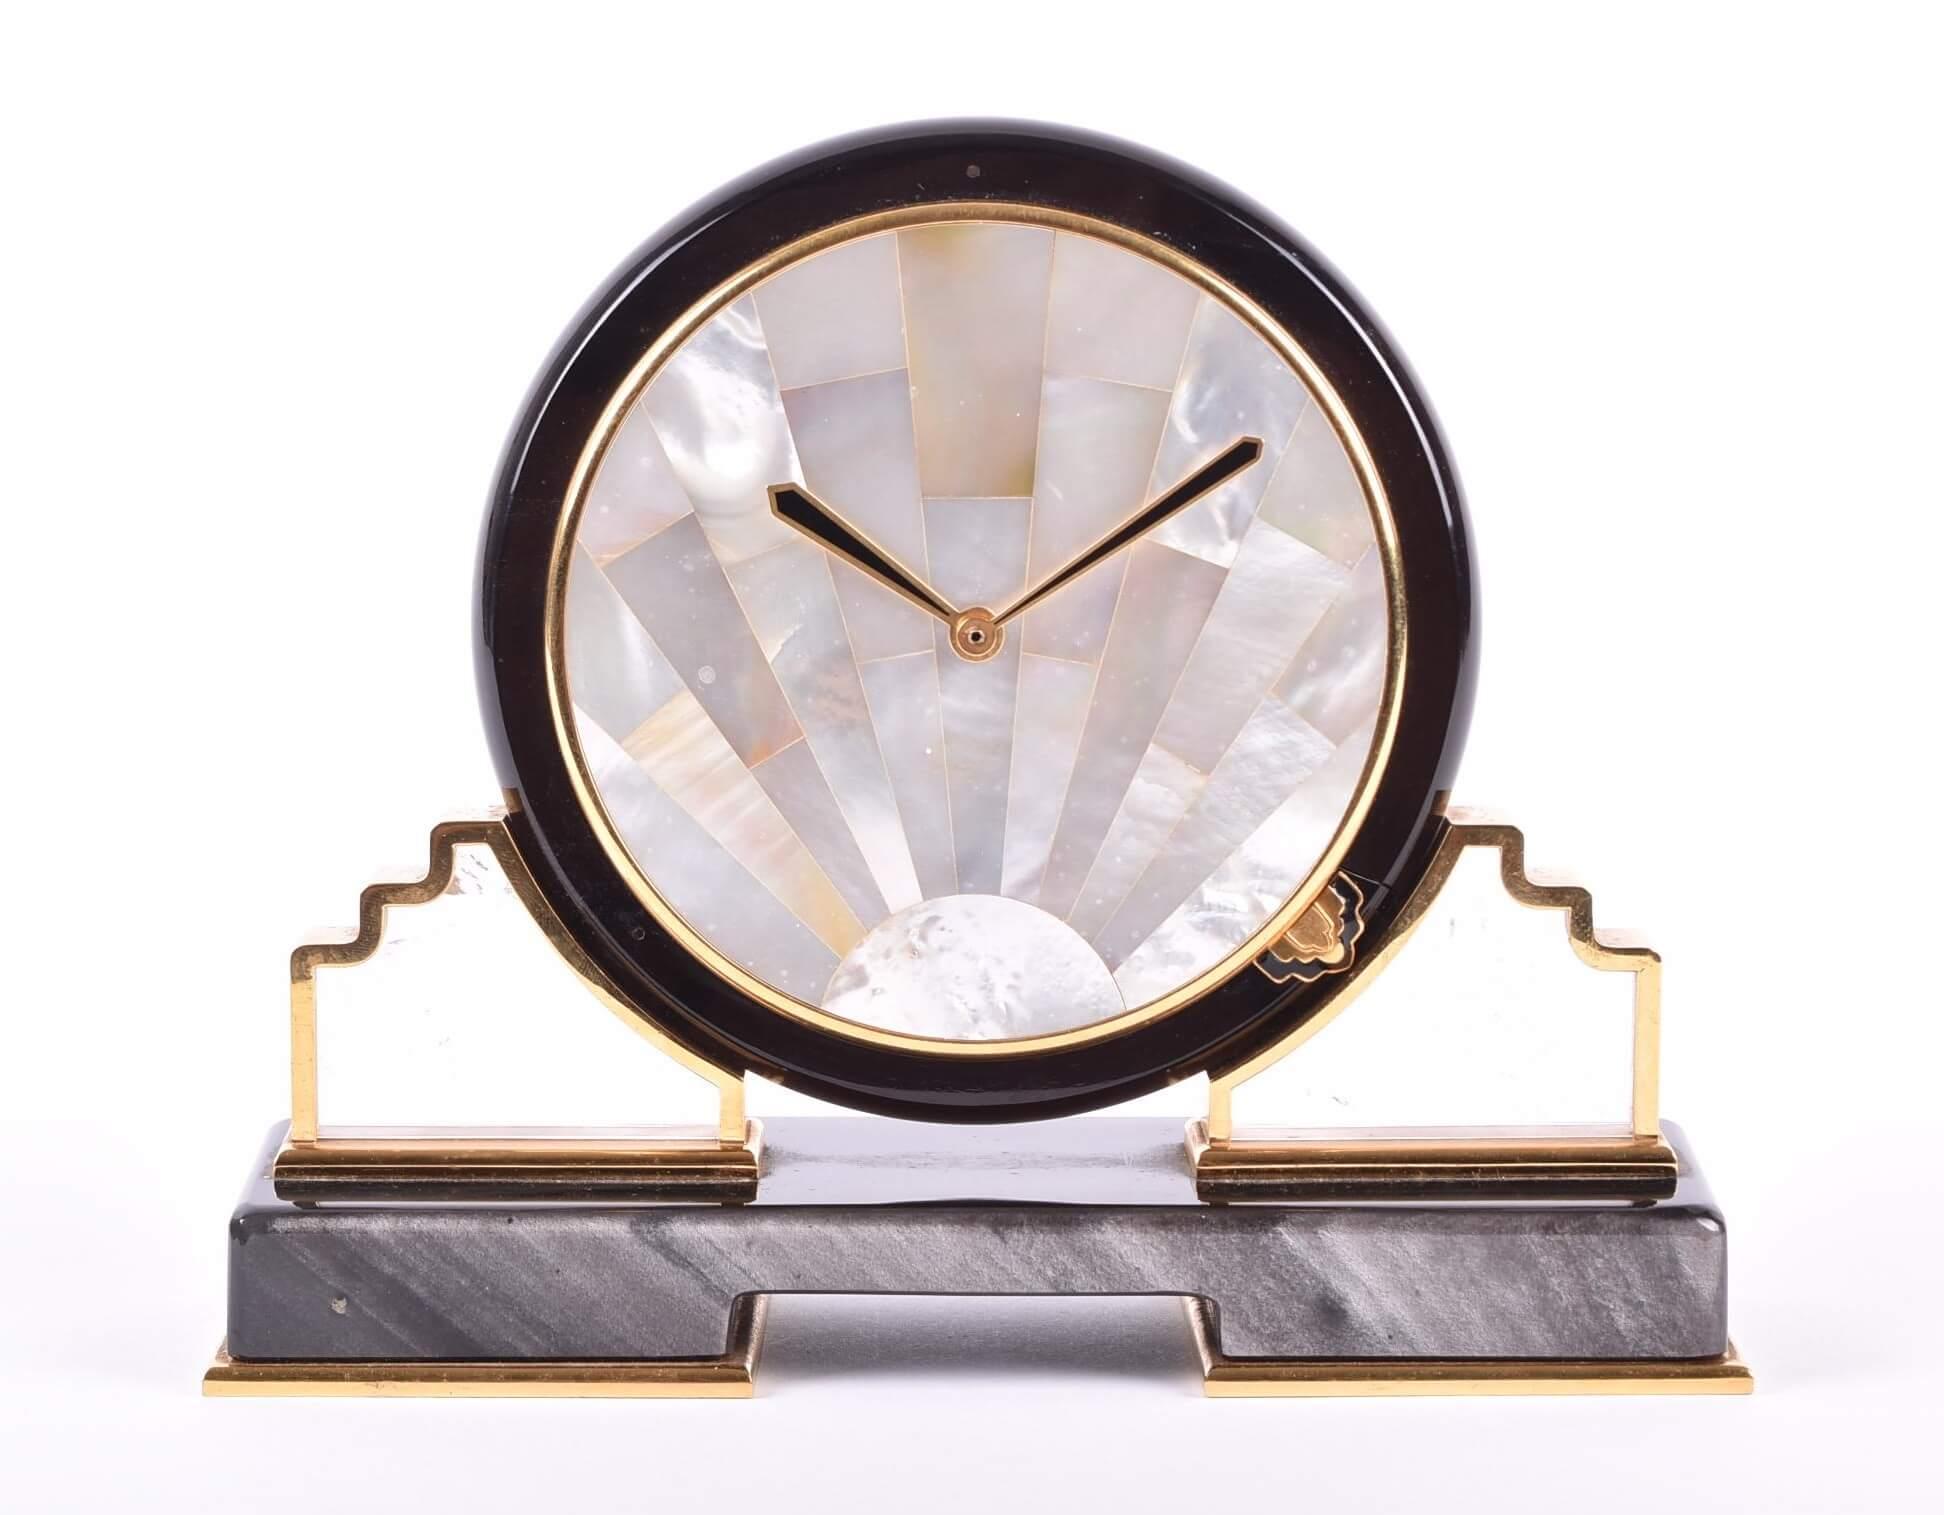 A Cartier Art Deco mother-of-pearl mantel clock